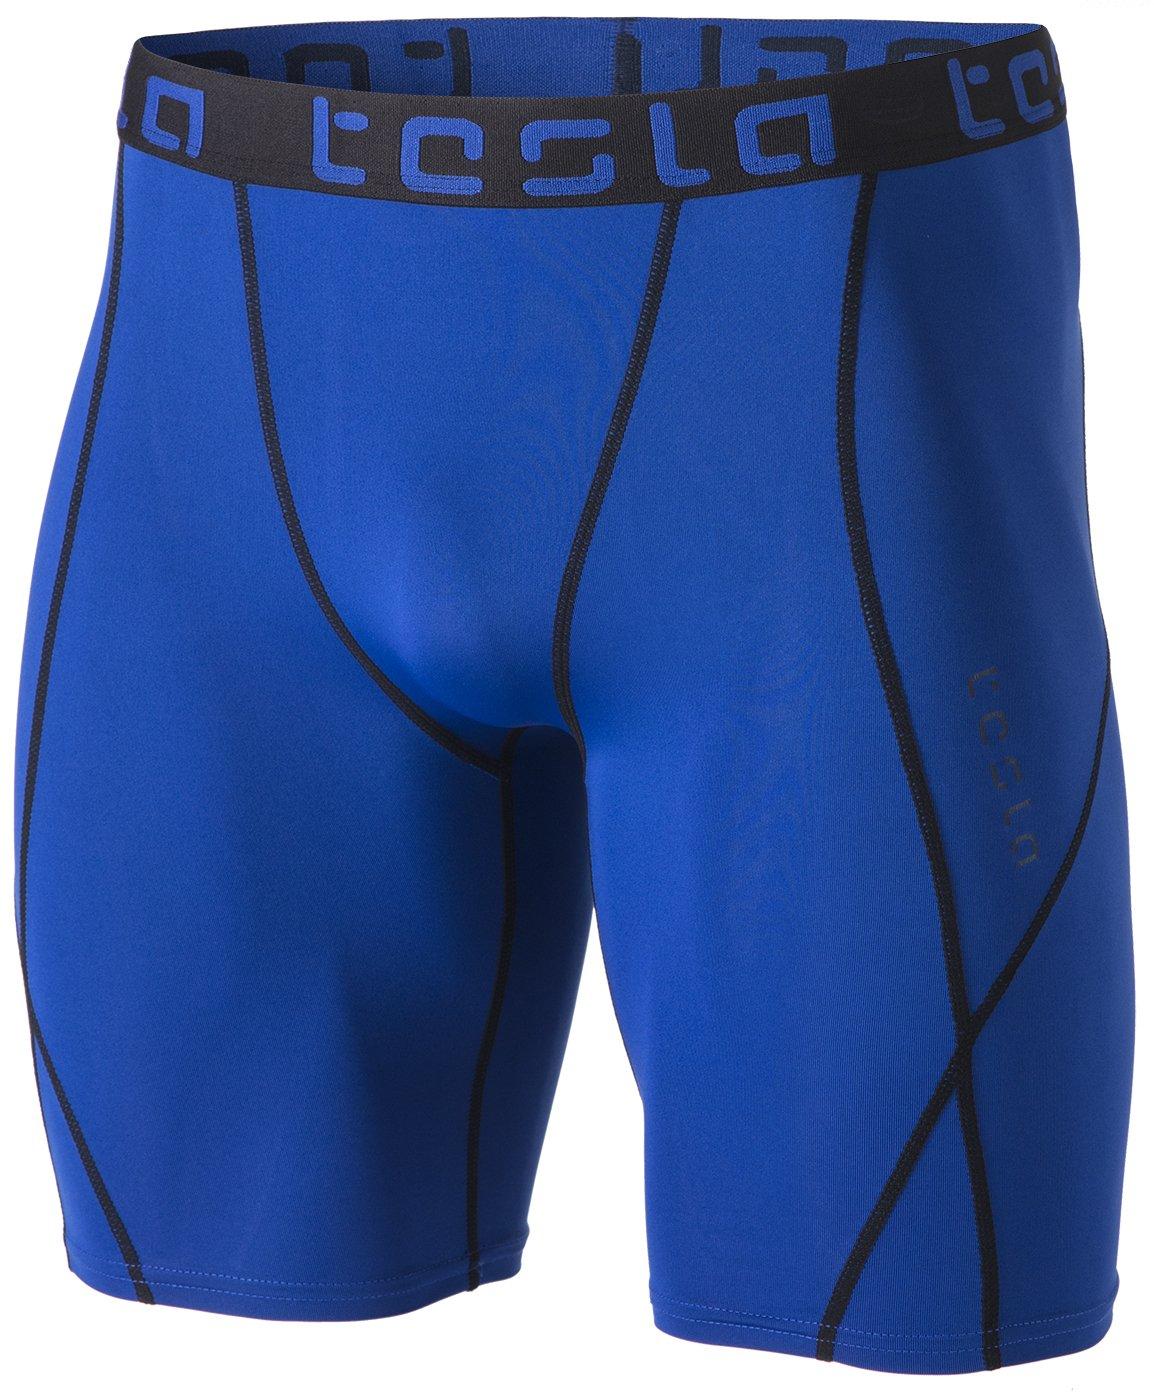 TSLA Men's Compression Shorts Baselayer Cool Dry